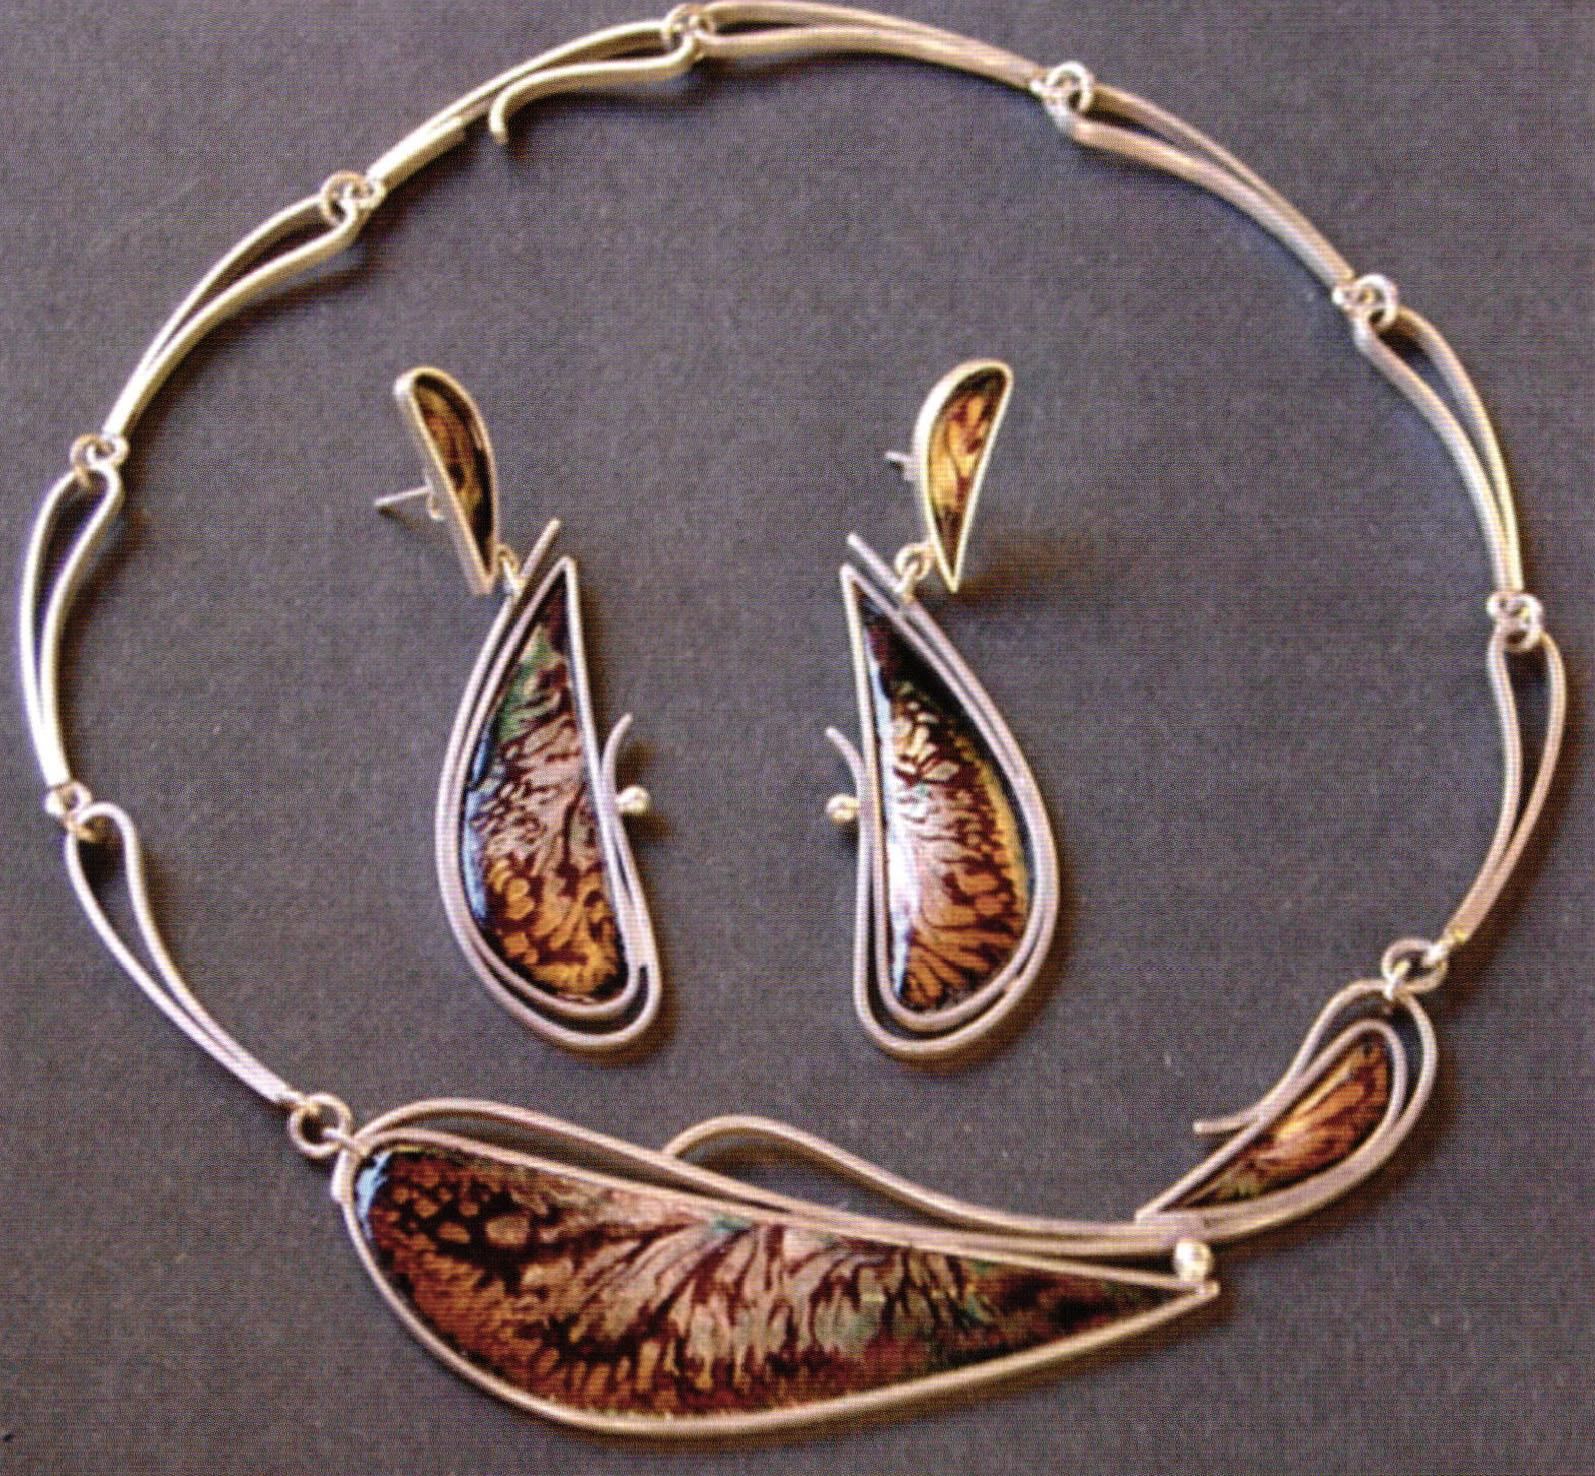 Cloisonne jewelry - beautifulearthja.com